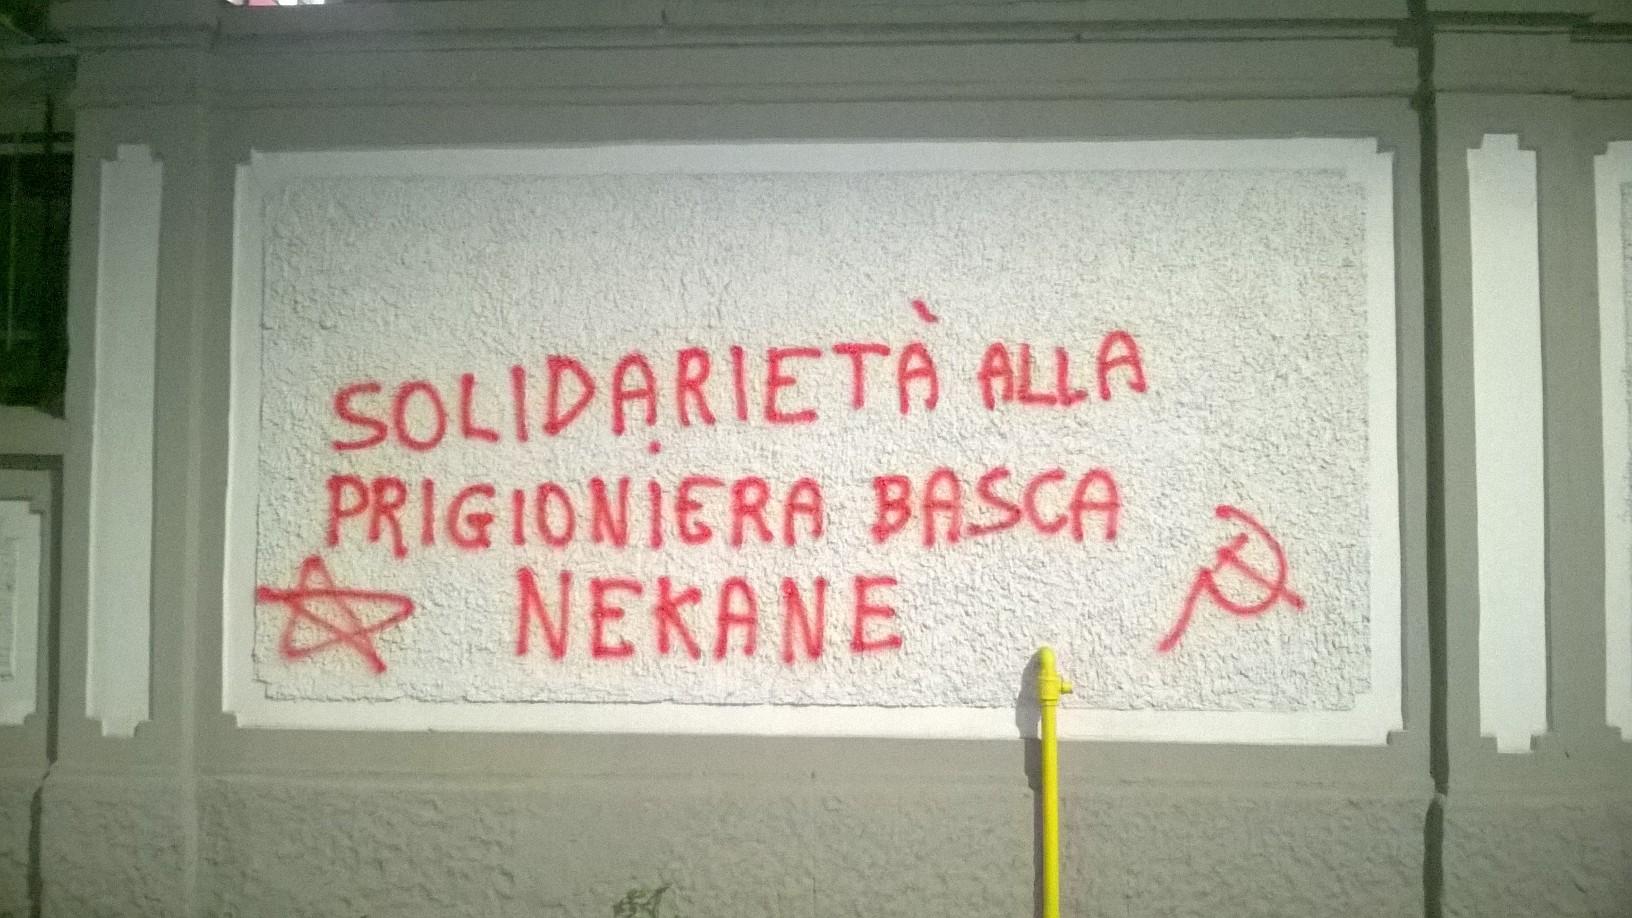 Solidarity for Nekane in Milan